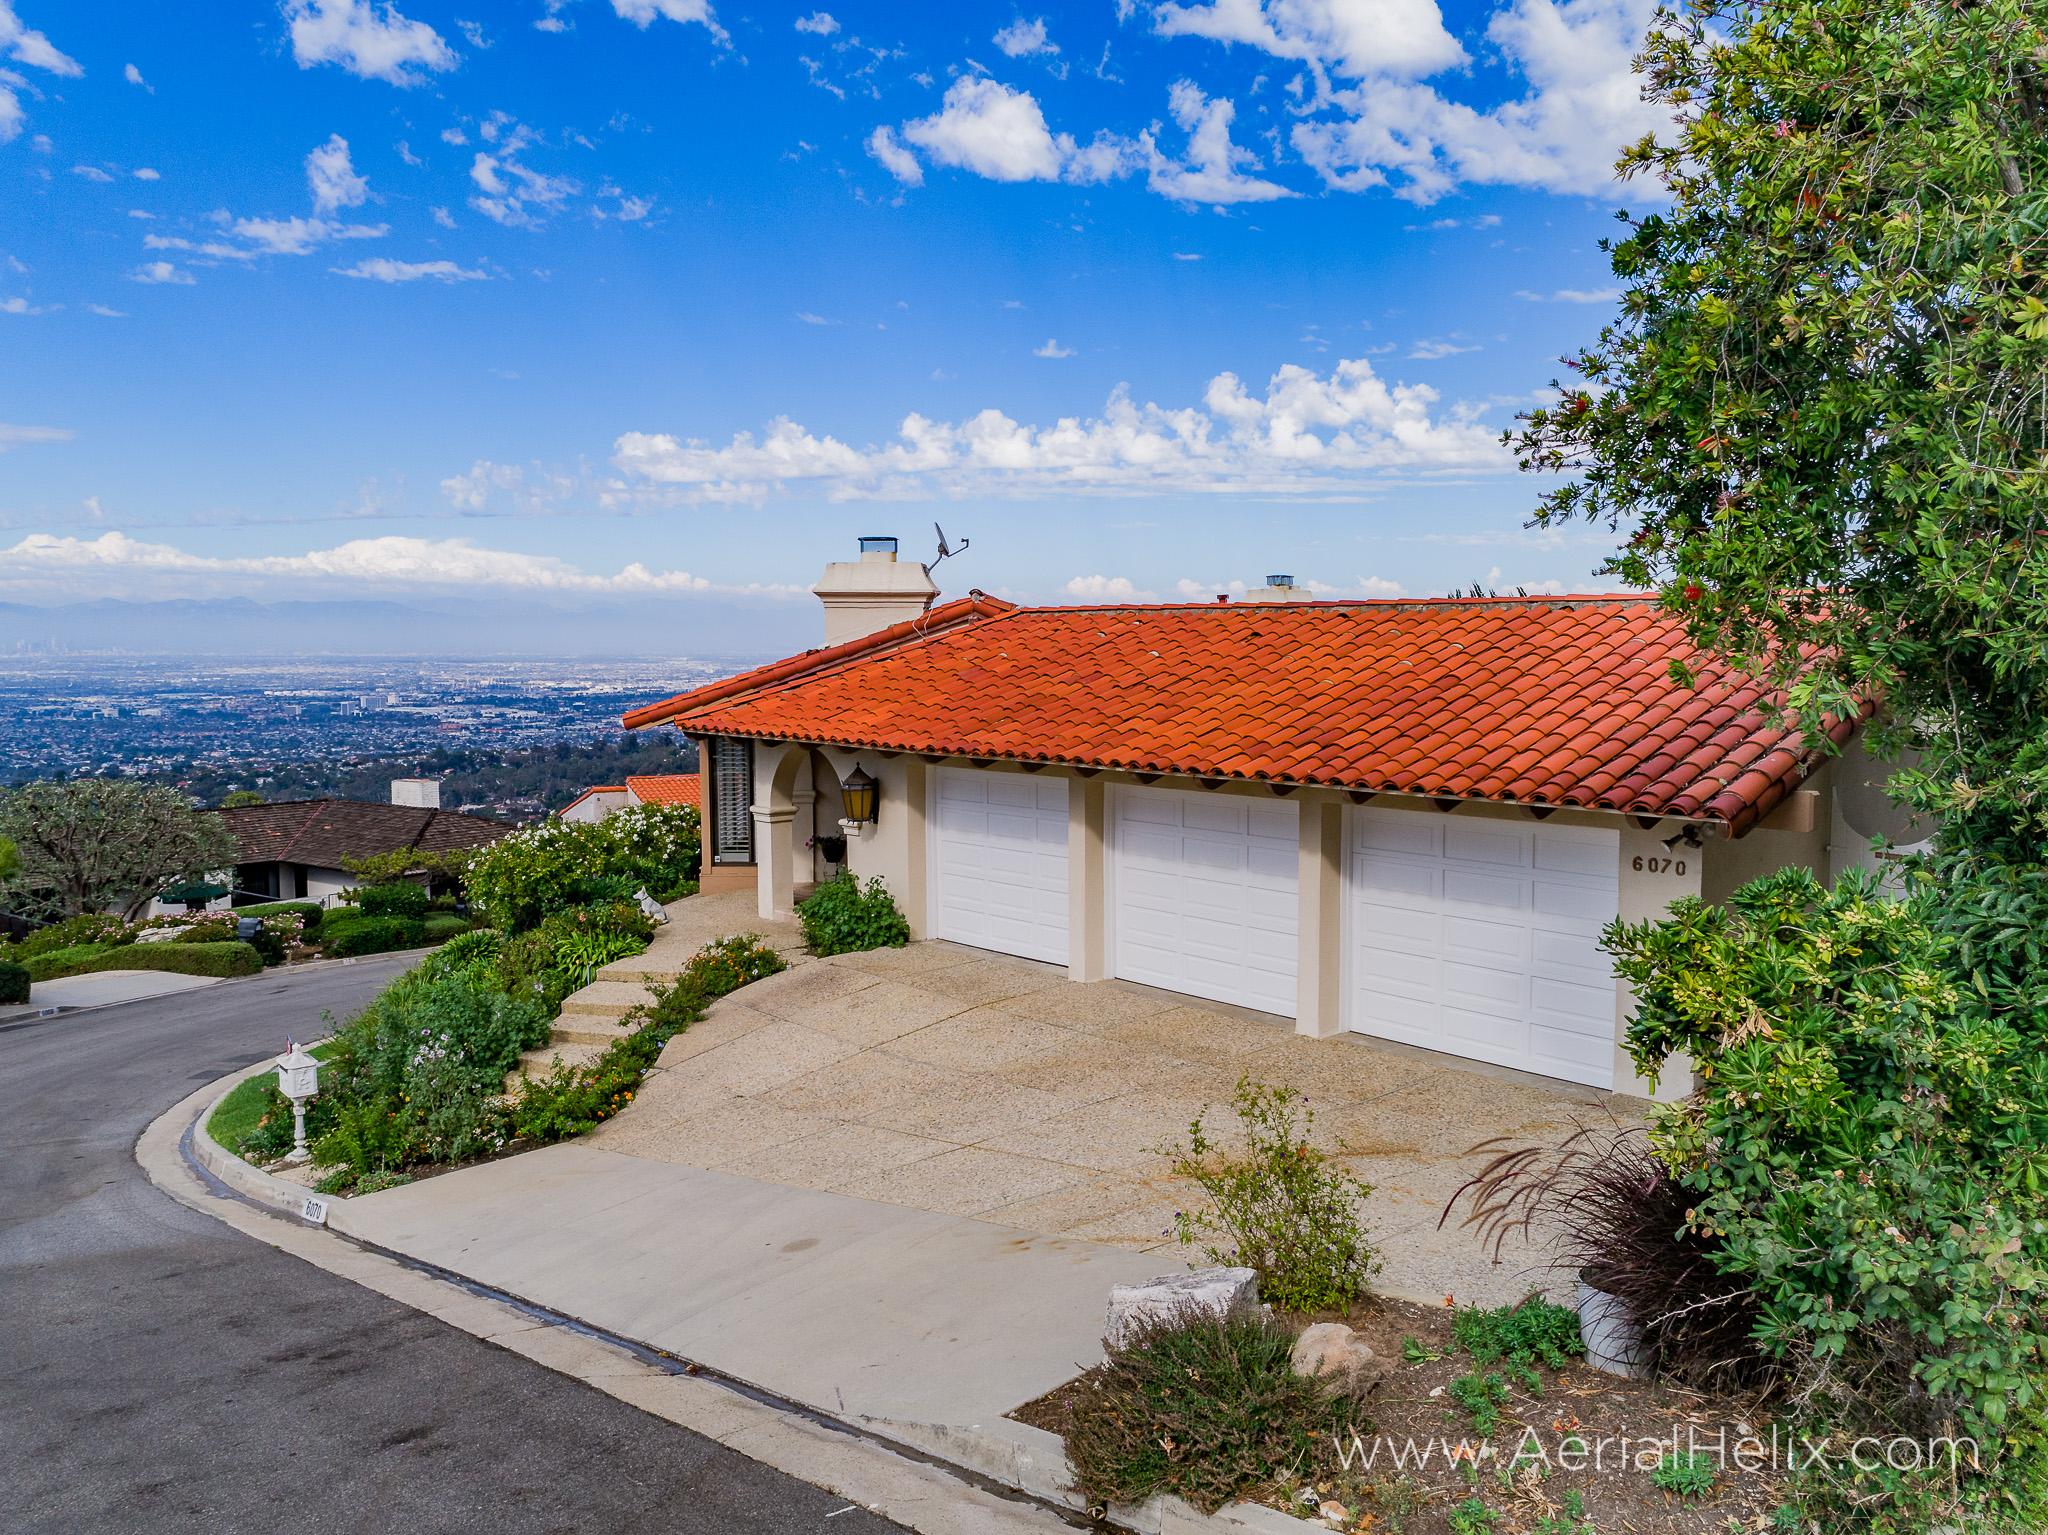 Woodfern Drive - HELIX Real Estate Aerial Photographer-6.jpg